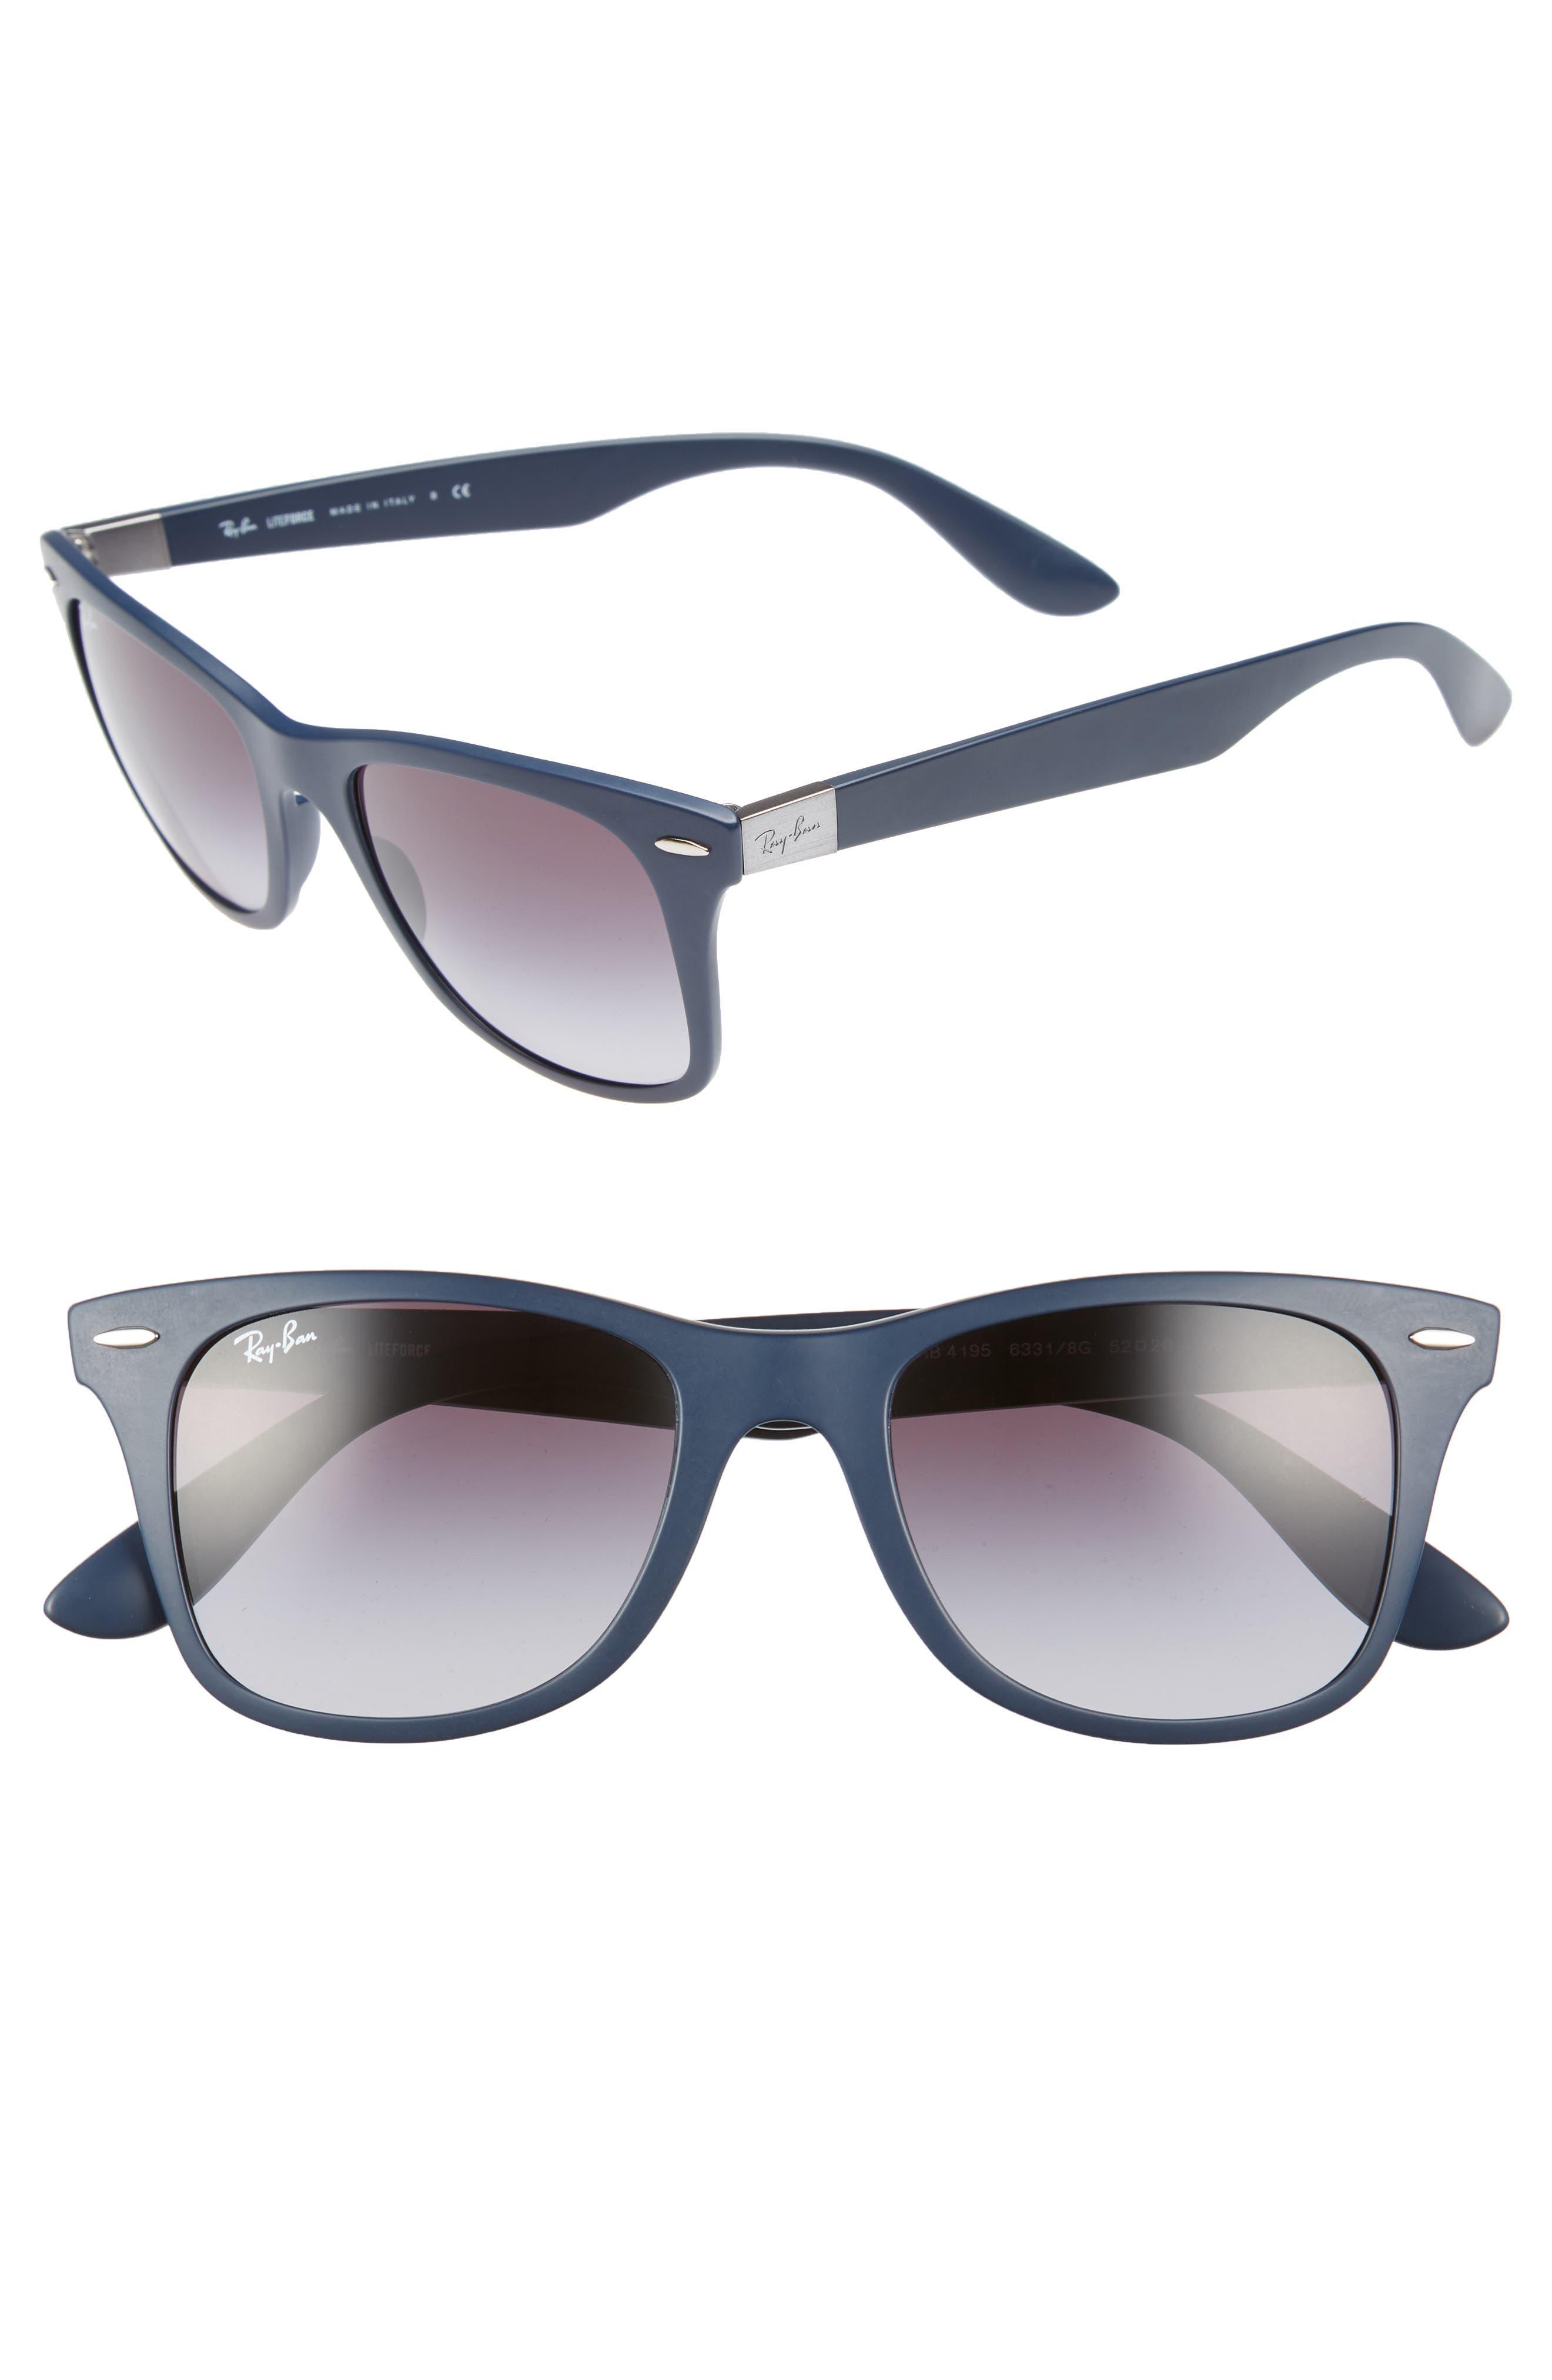 52mm Sunglasses,                         Main,                         color, Blue/ Grey